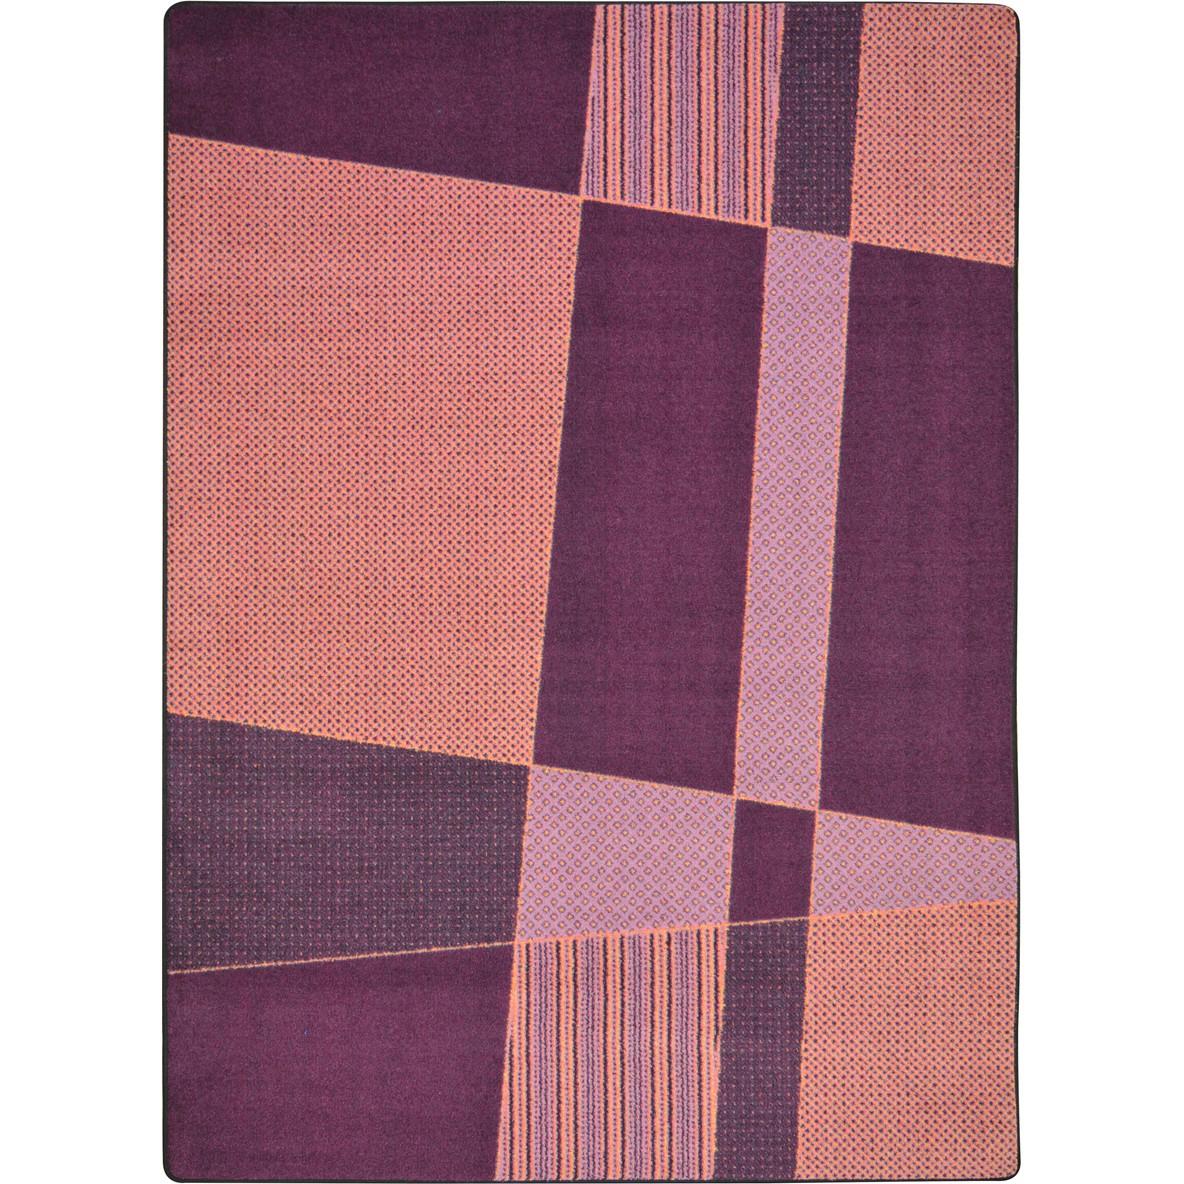 "Joy Rugs Spazz Machine Tufted - Cut Pile Purple 3'10"" x 5'4"" - Area Rug"